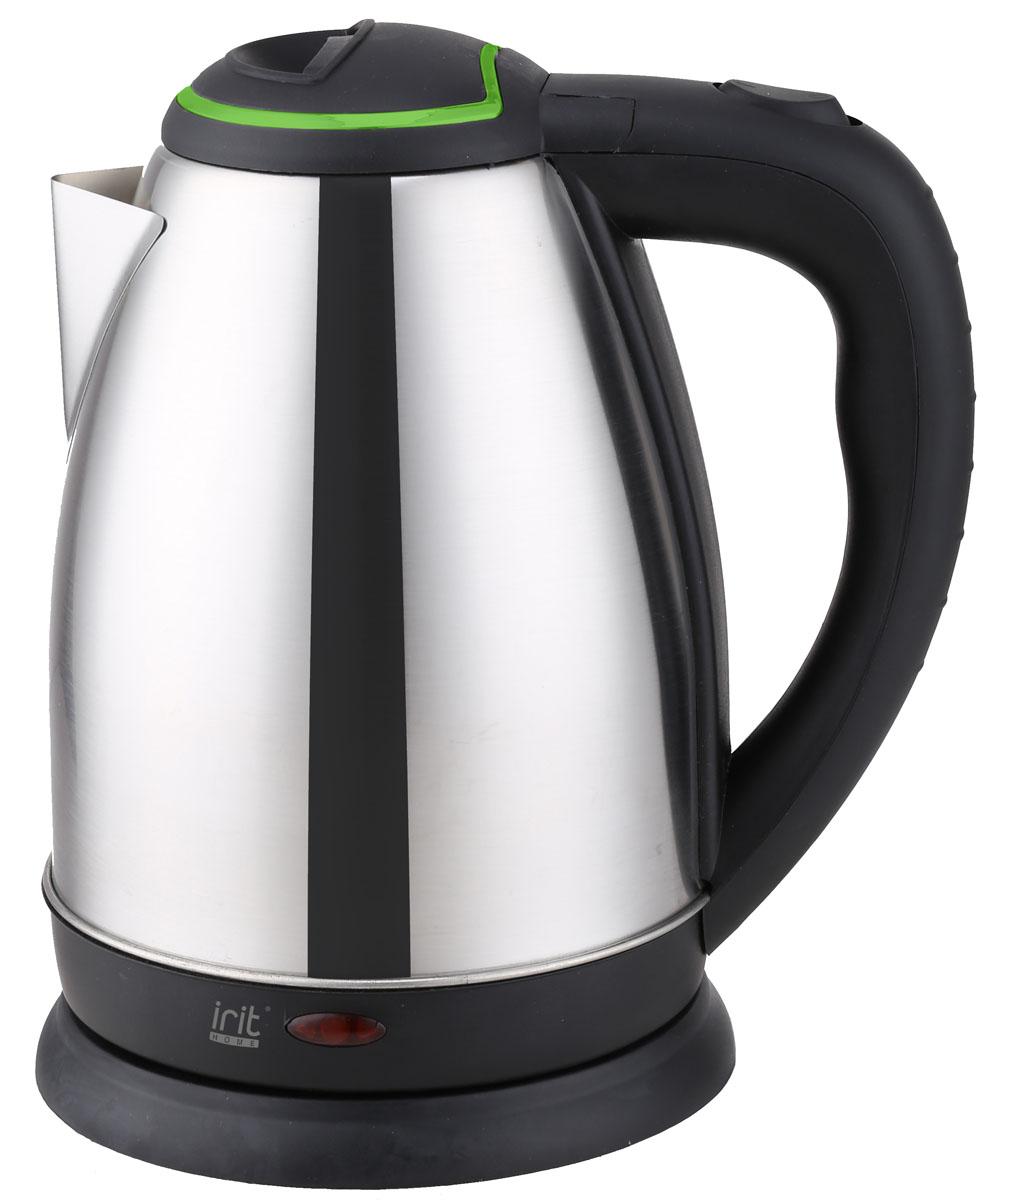 лучшая цена Электрический чайник Irit IR-1338, Green